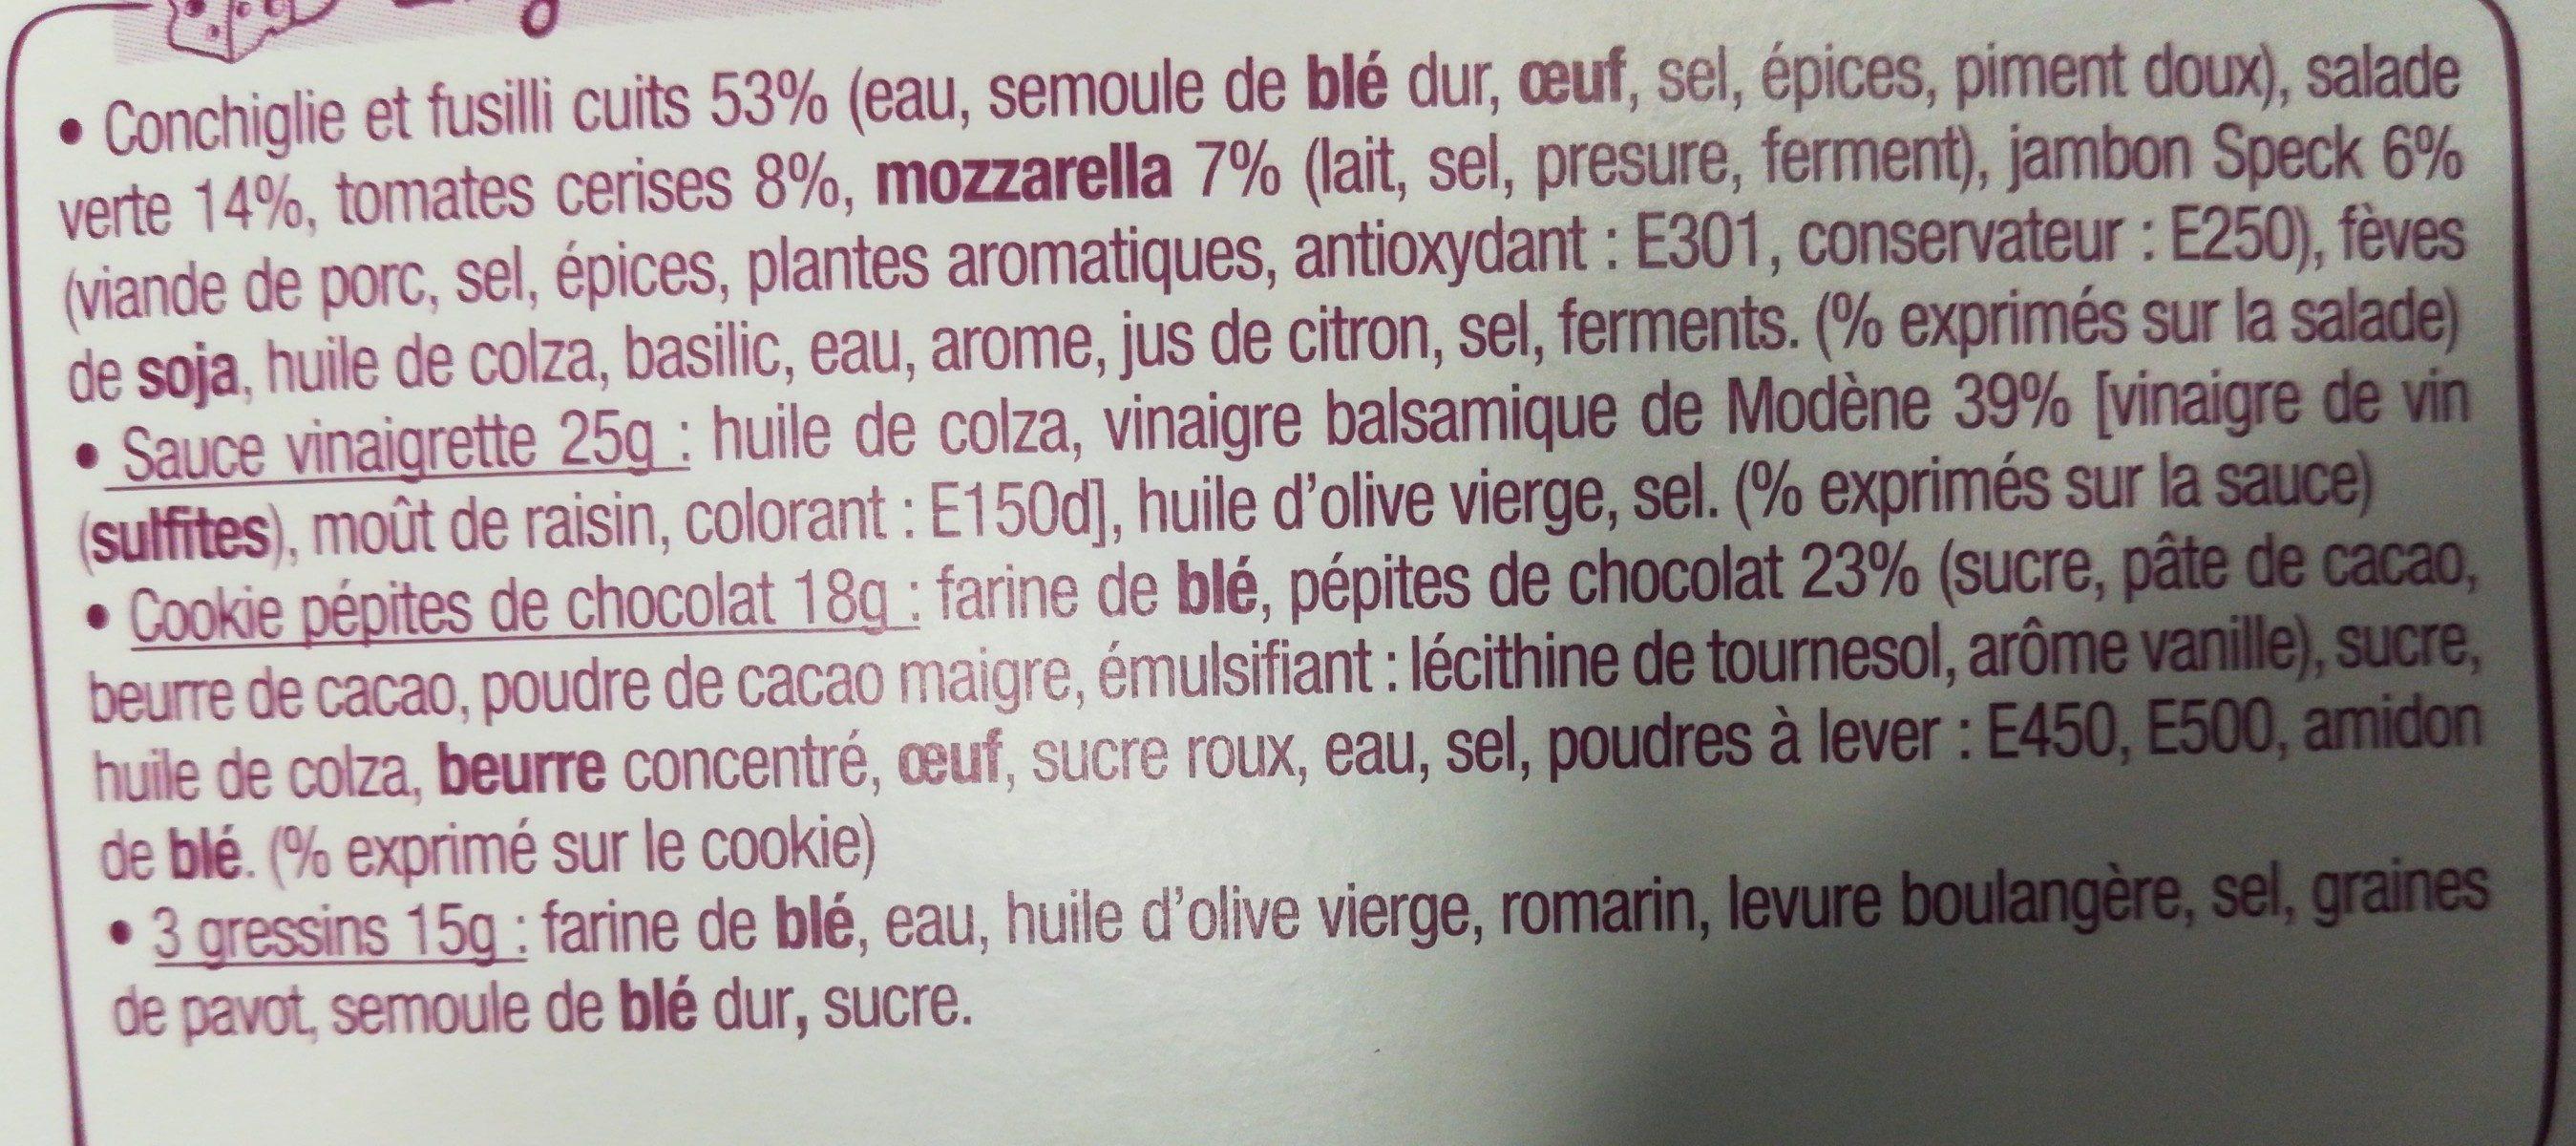 Salade & Compagnie - Roma - Ingredientes